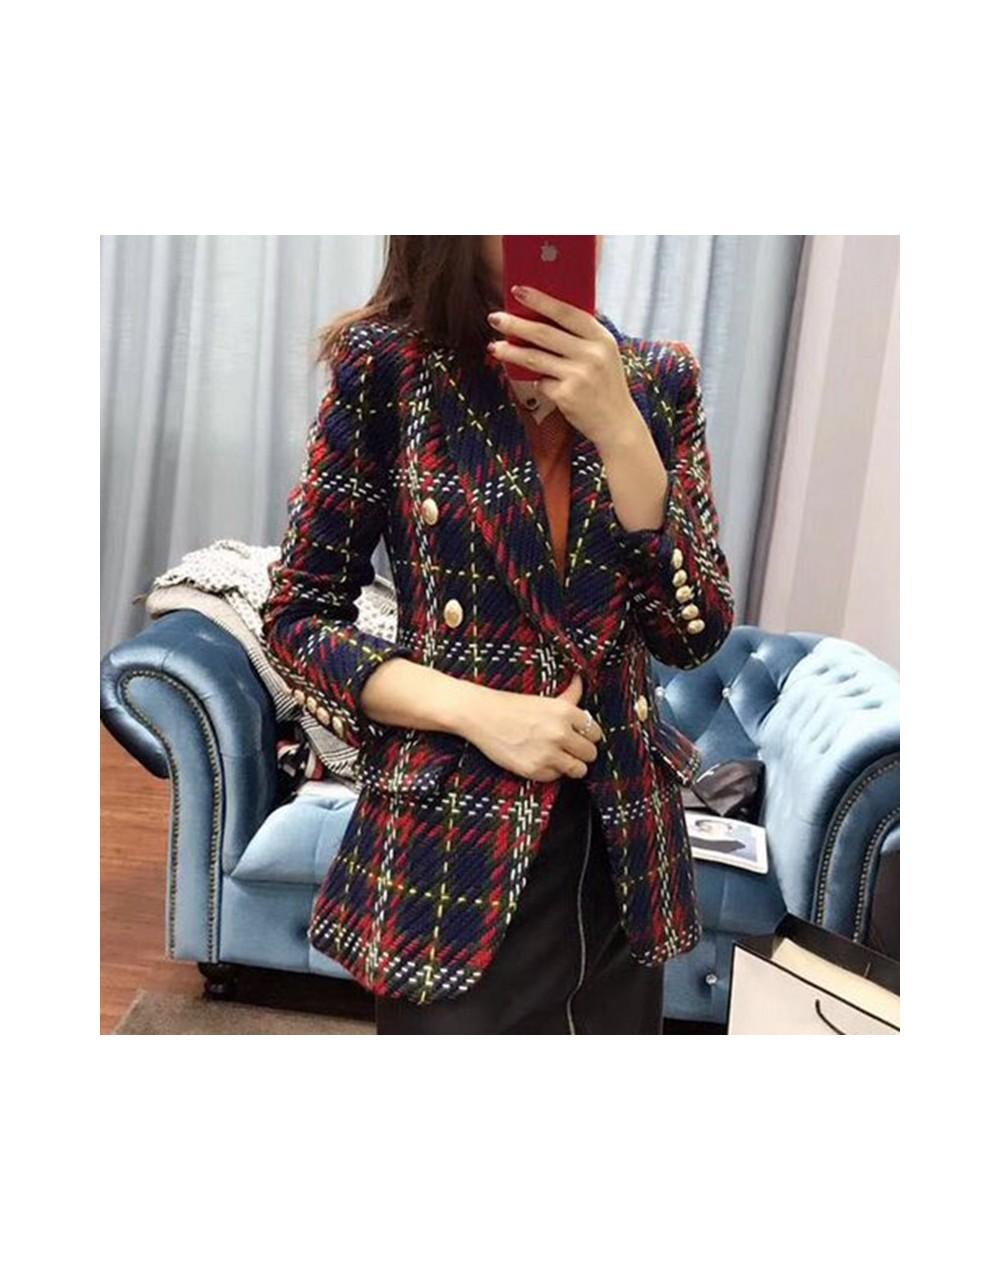 HIGH STREET New Fashion 2019 Baroque Designer Blazer Coat Women's Double Breasted Lion Buttons Plaid Wool Tweed Blazer Overc...